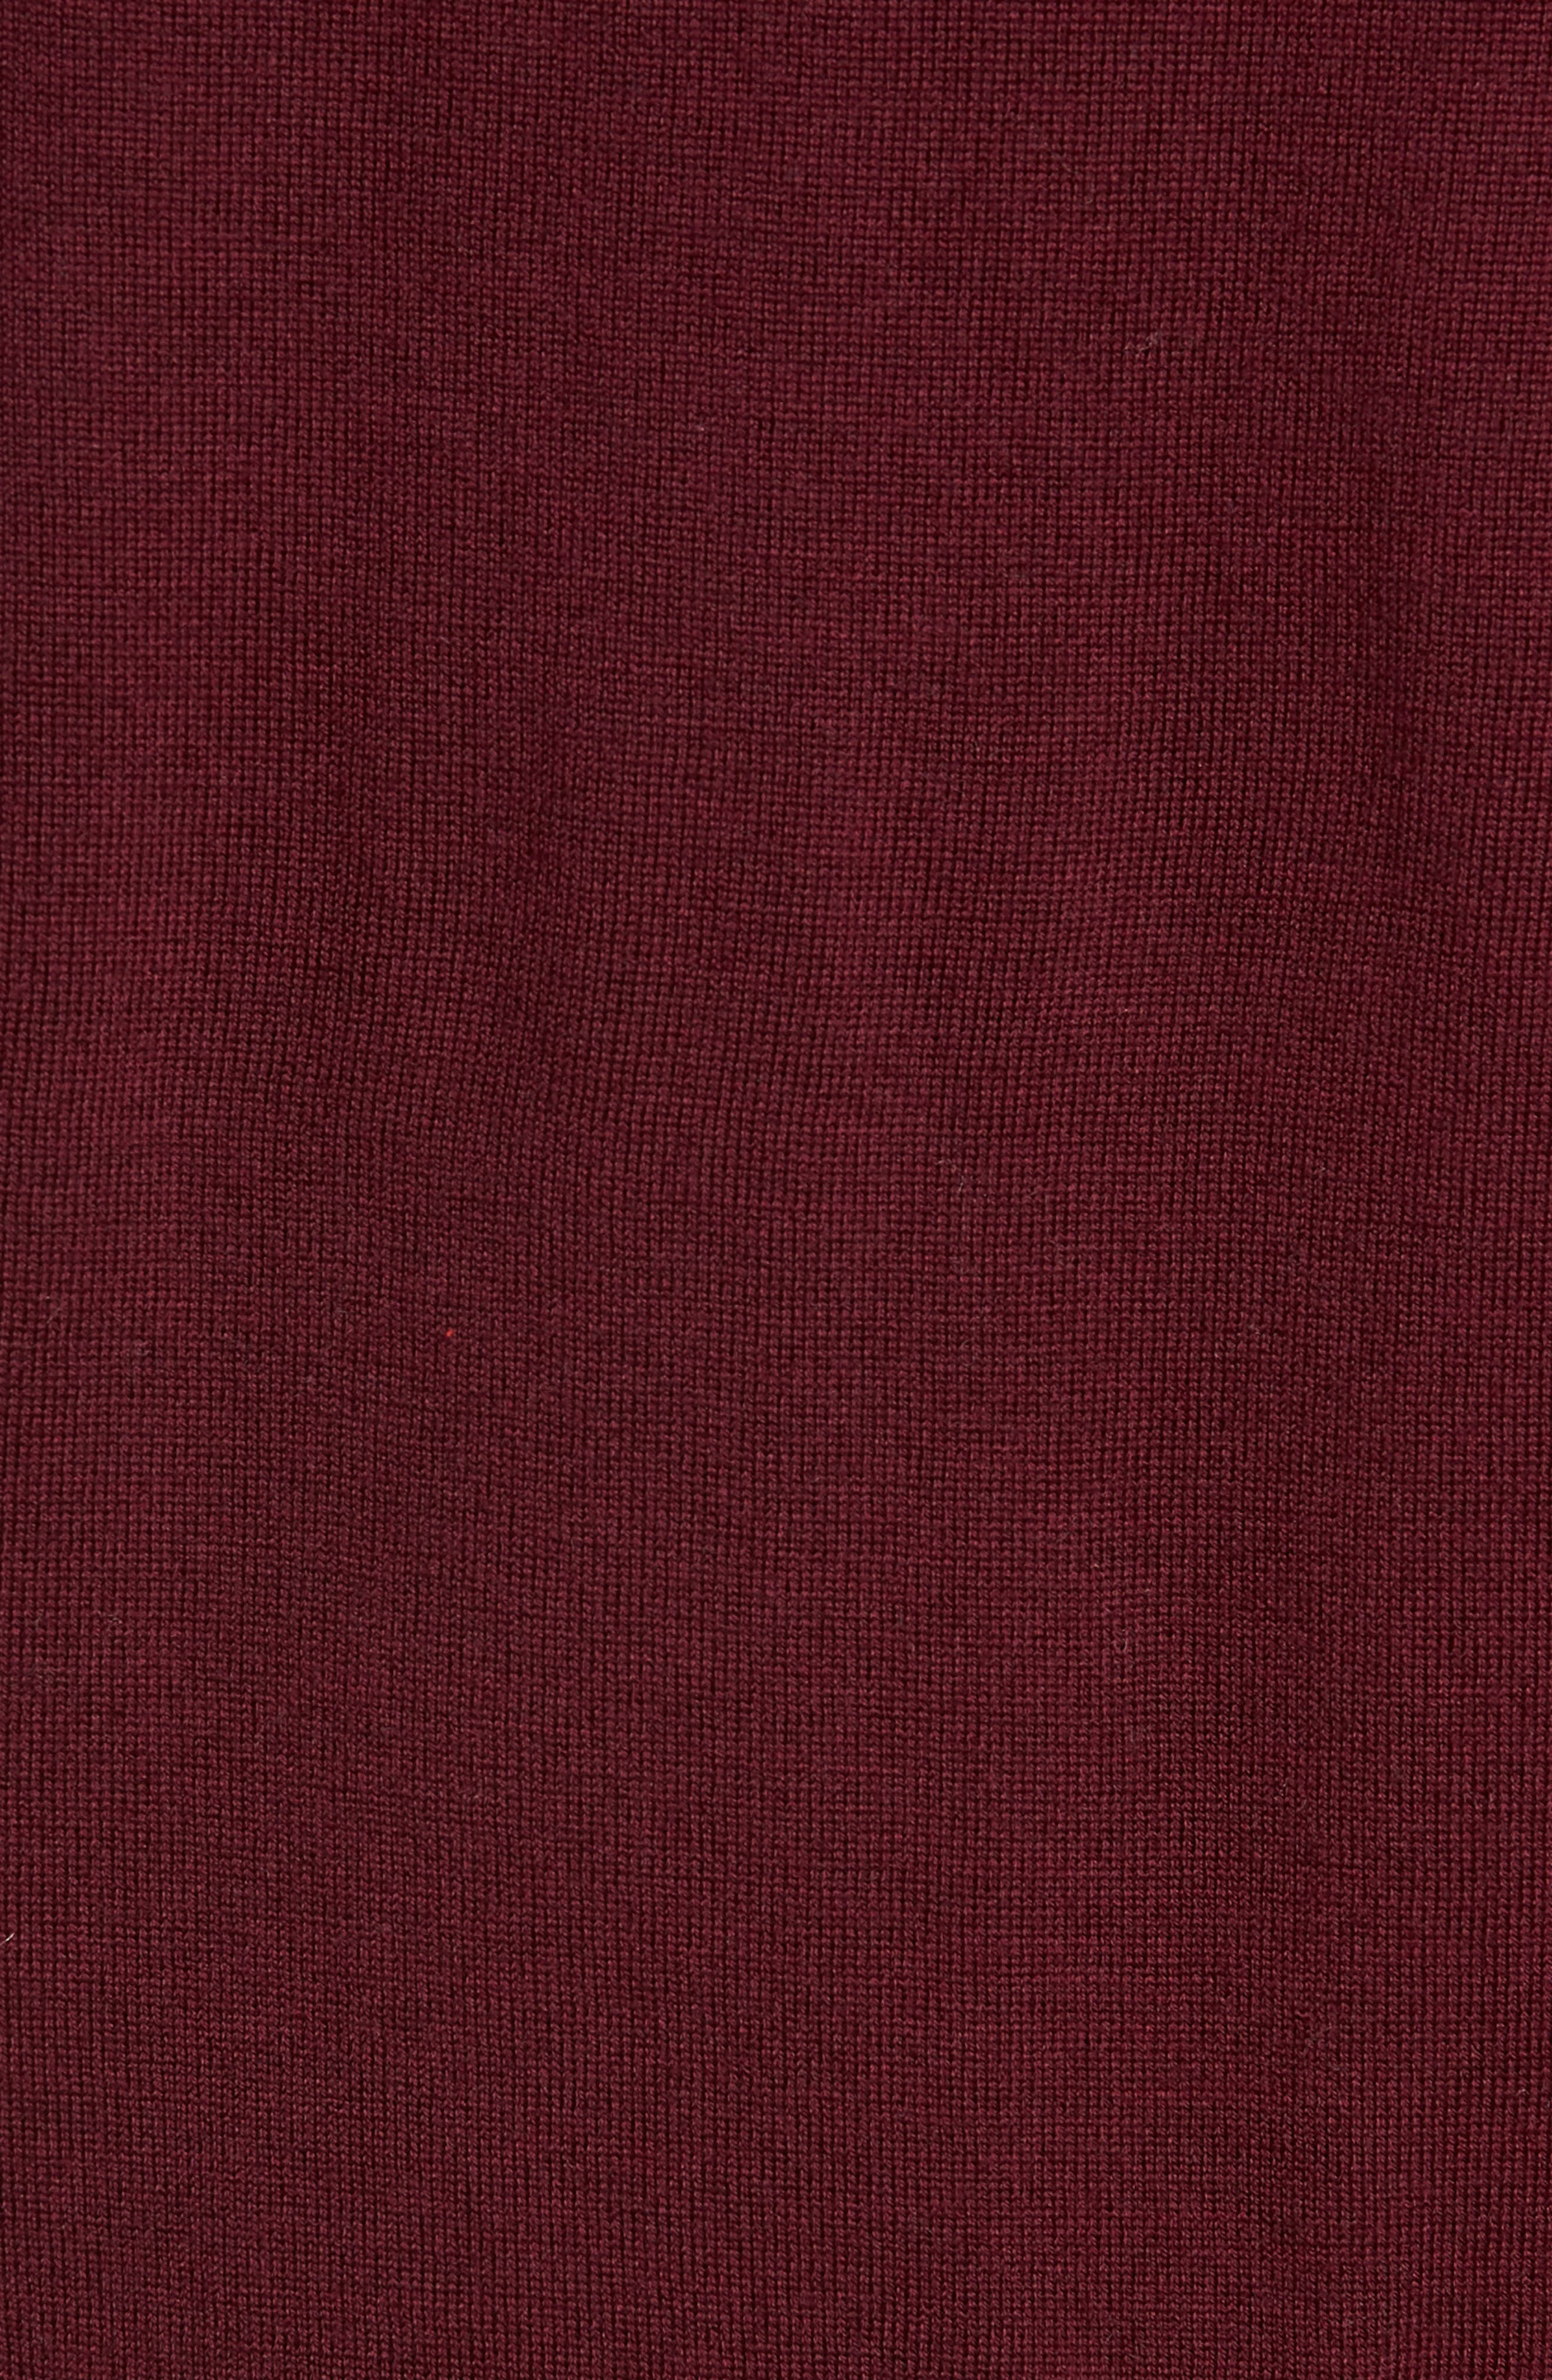 Heart Intarsia Regular Fit Merino Wool Sweater,                             Alternate thumbnail 5, color,                             BEETROOT